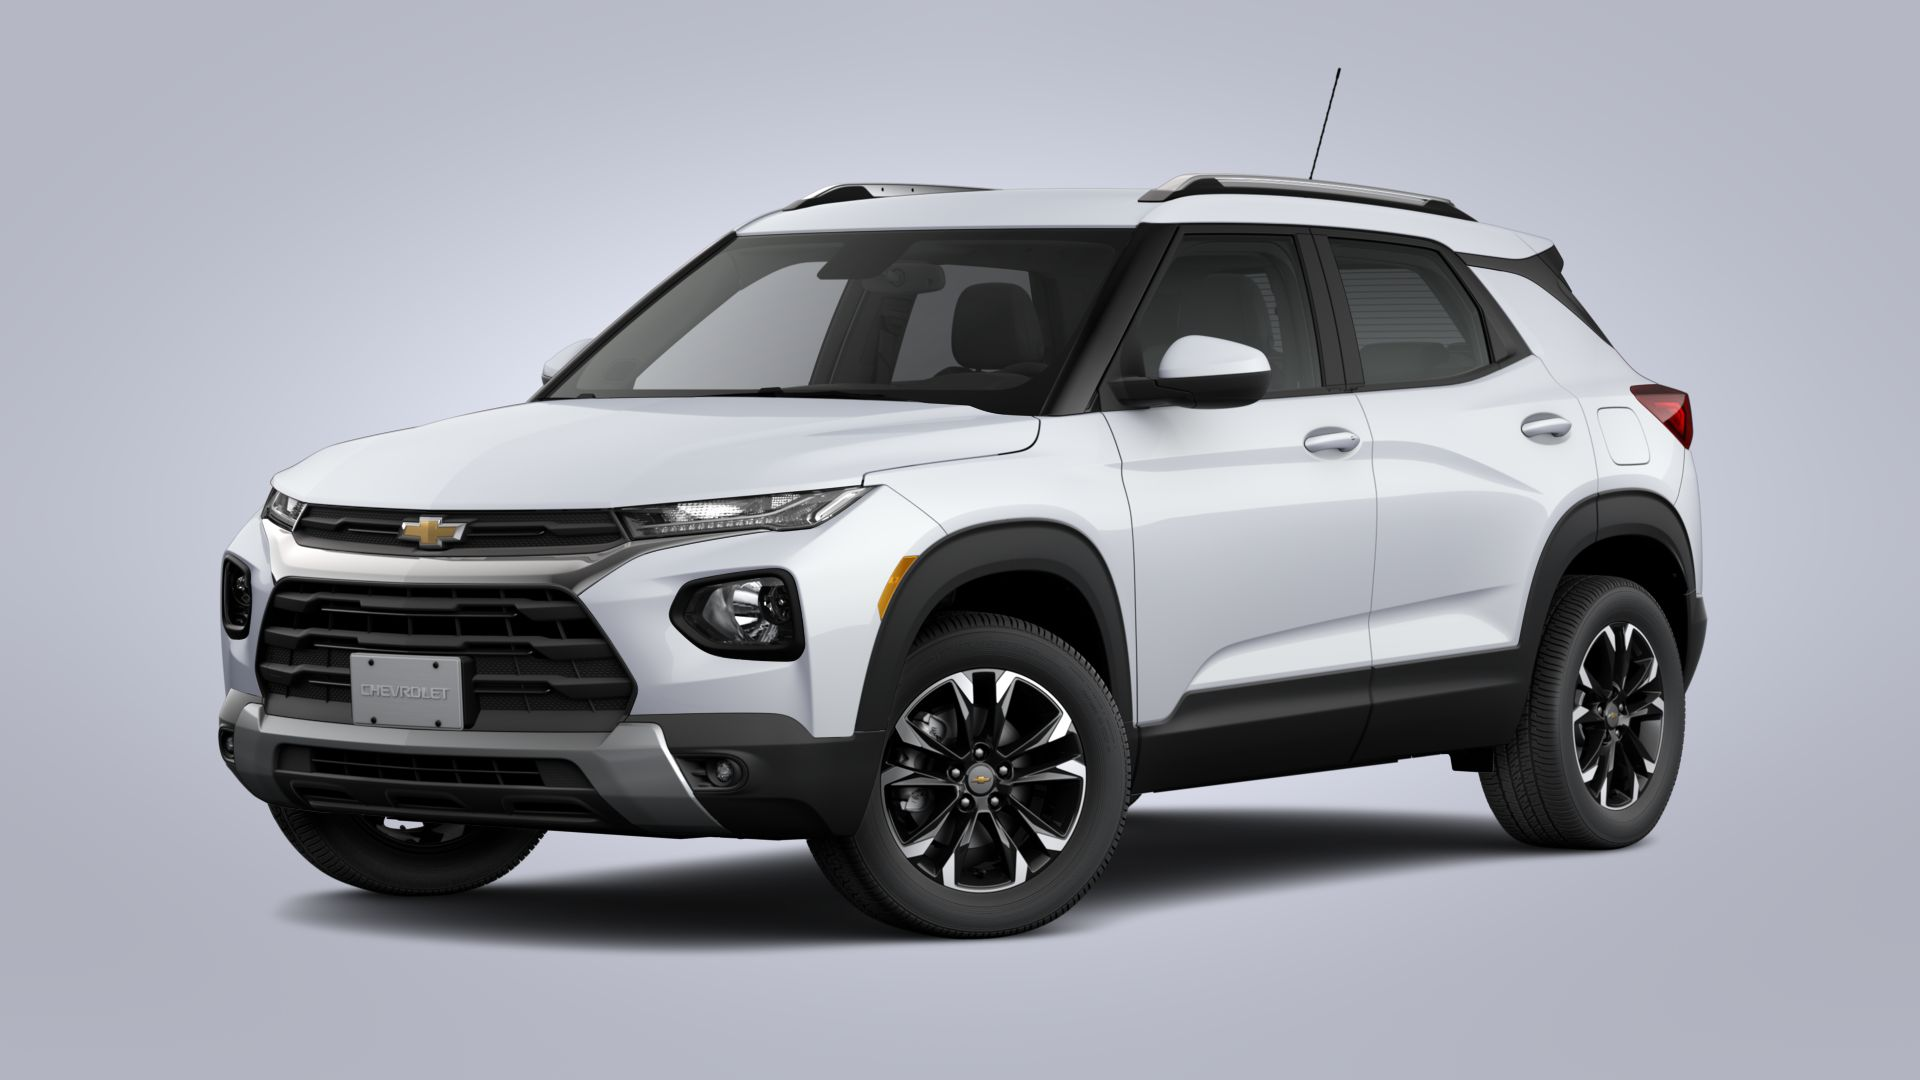 New 2021 Chevrolet Trailblazer LT SUV in Sulphur Springs ...